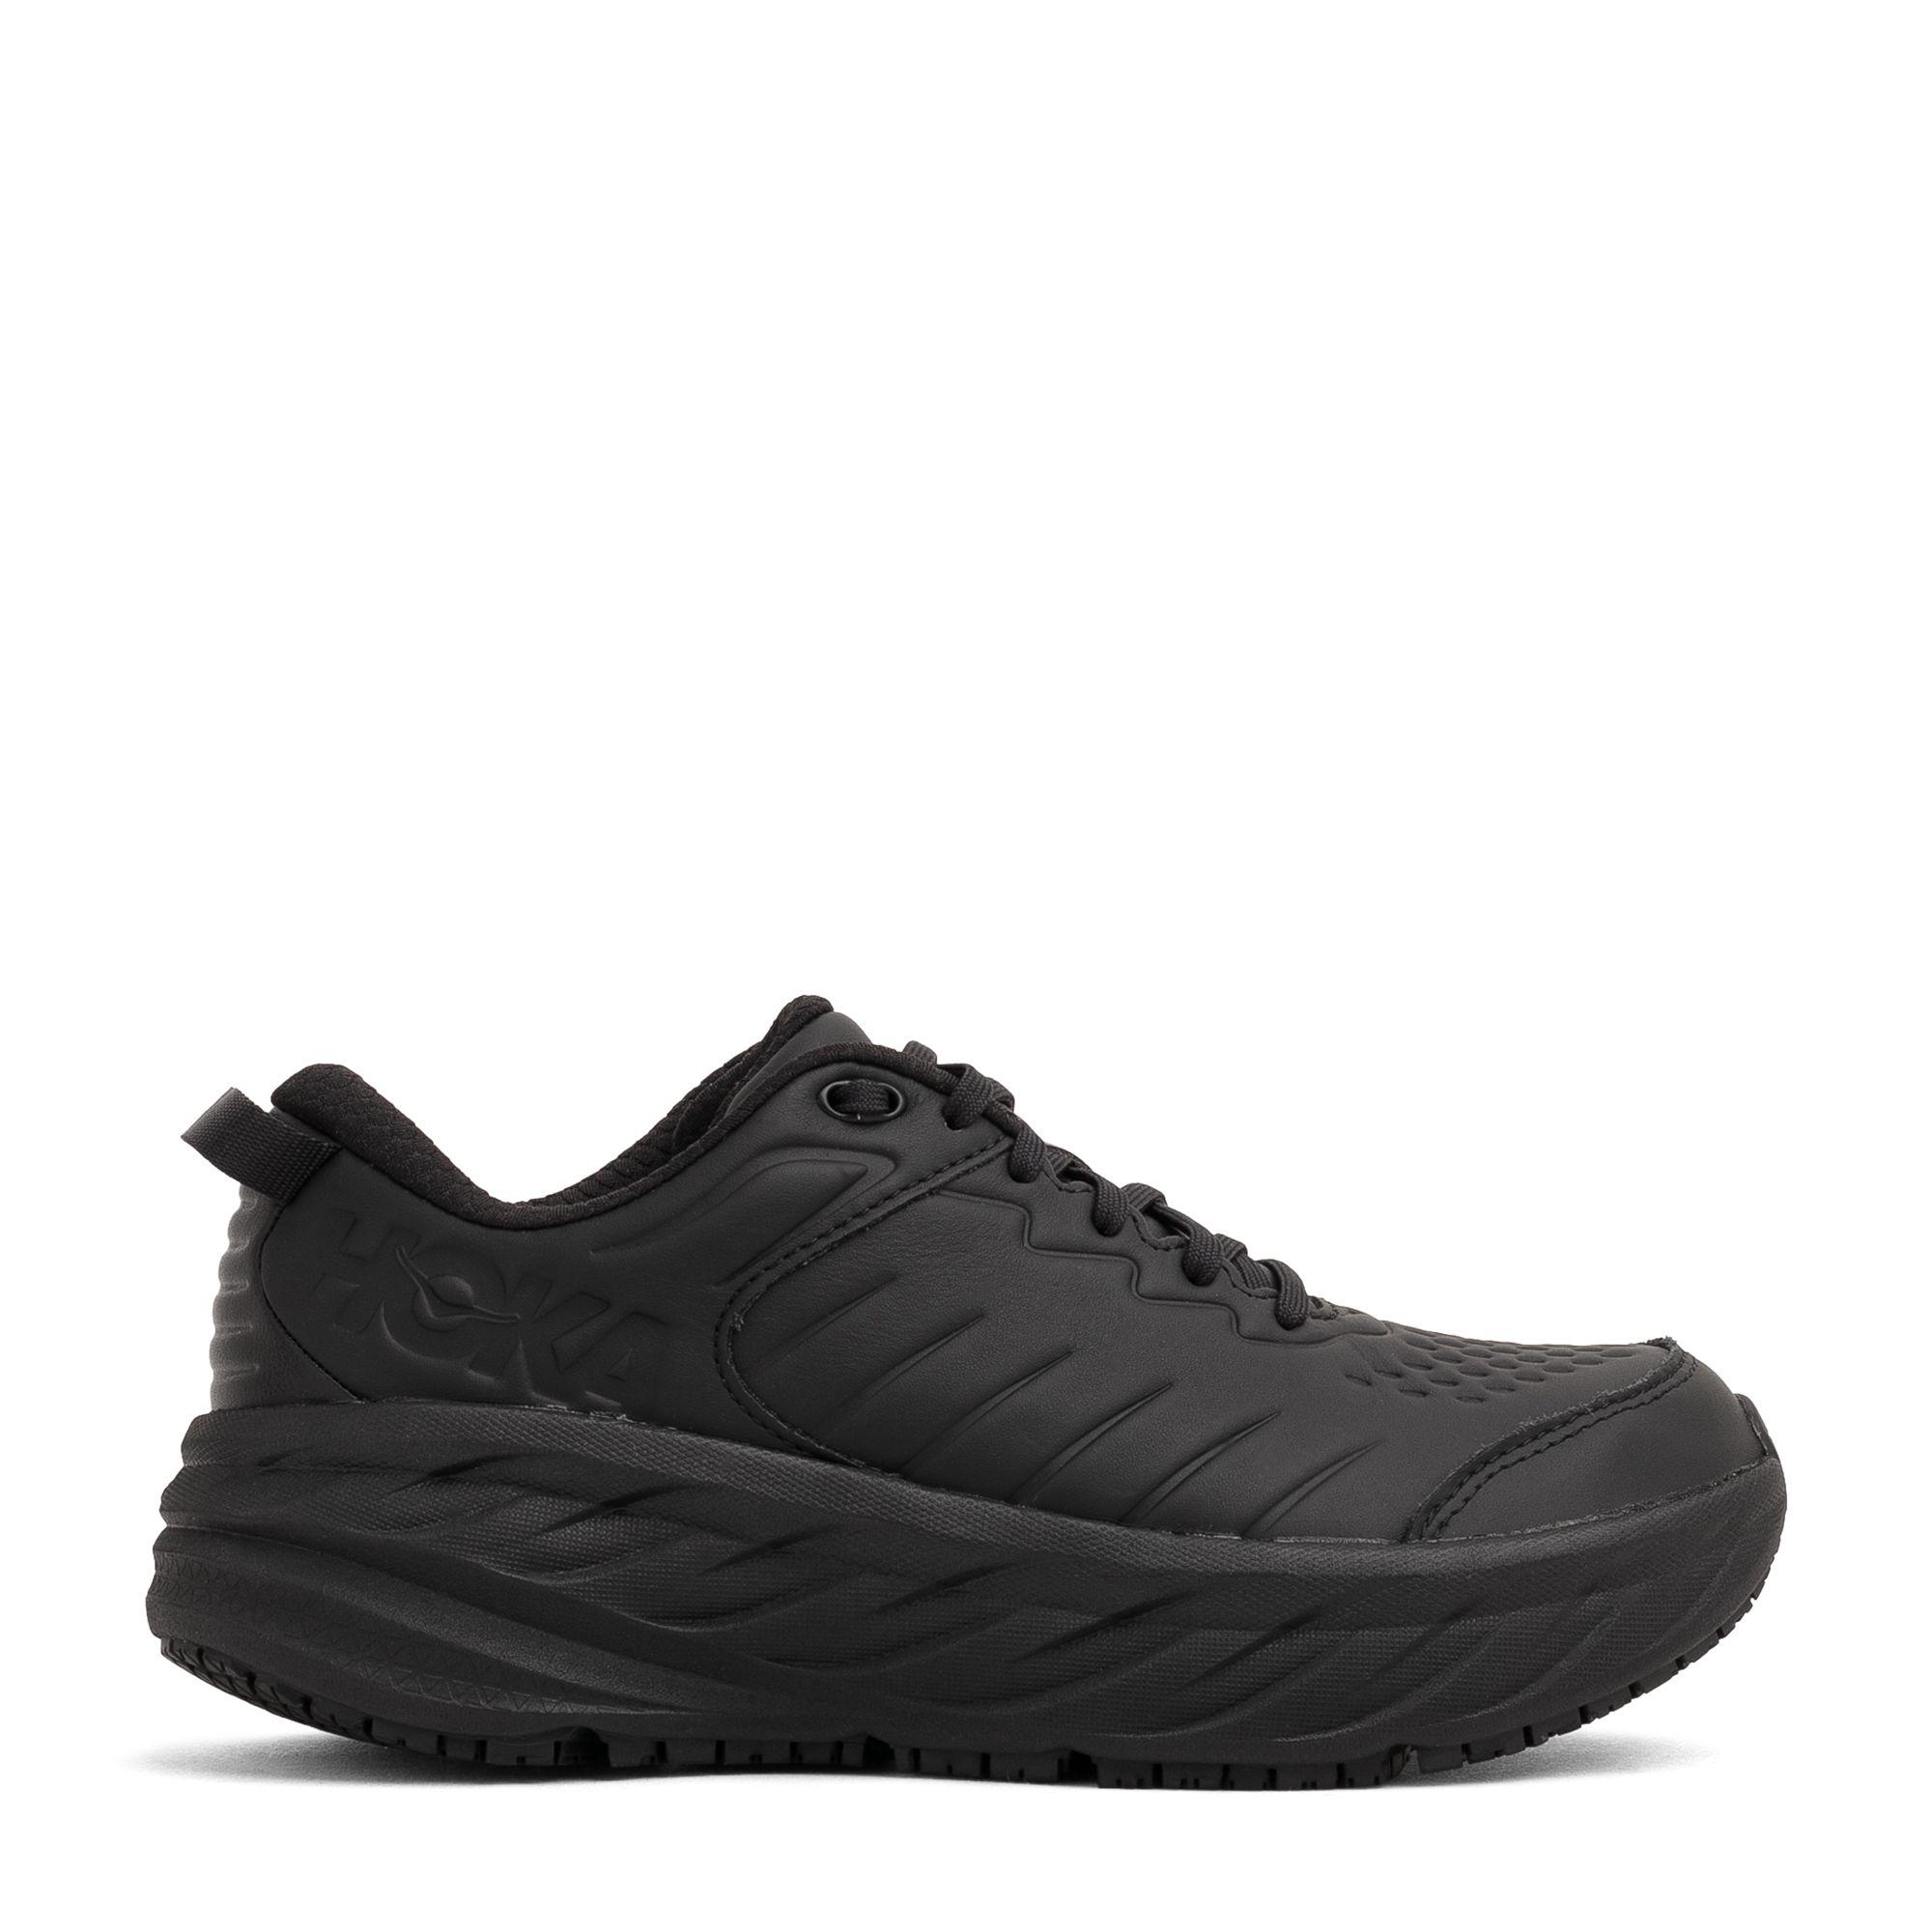 Bondi SR sneakers